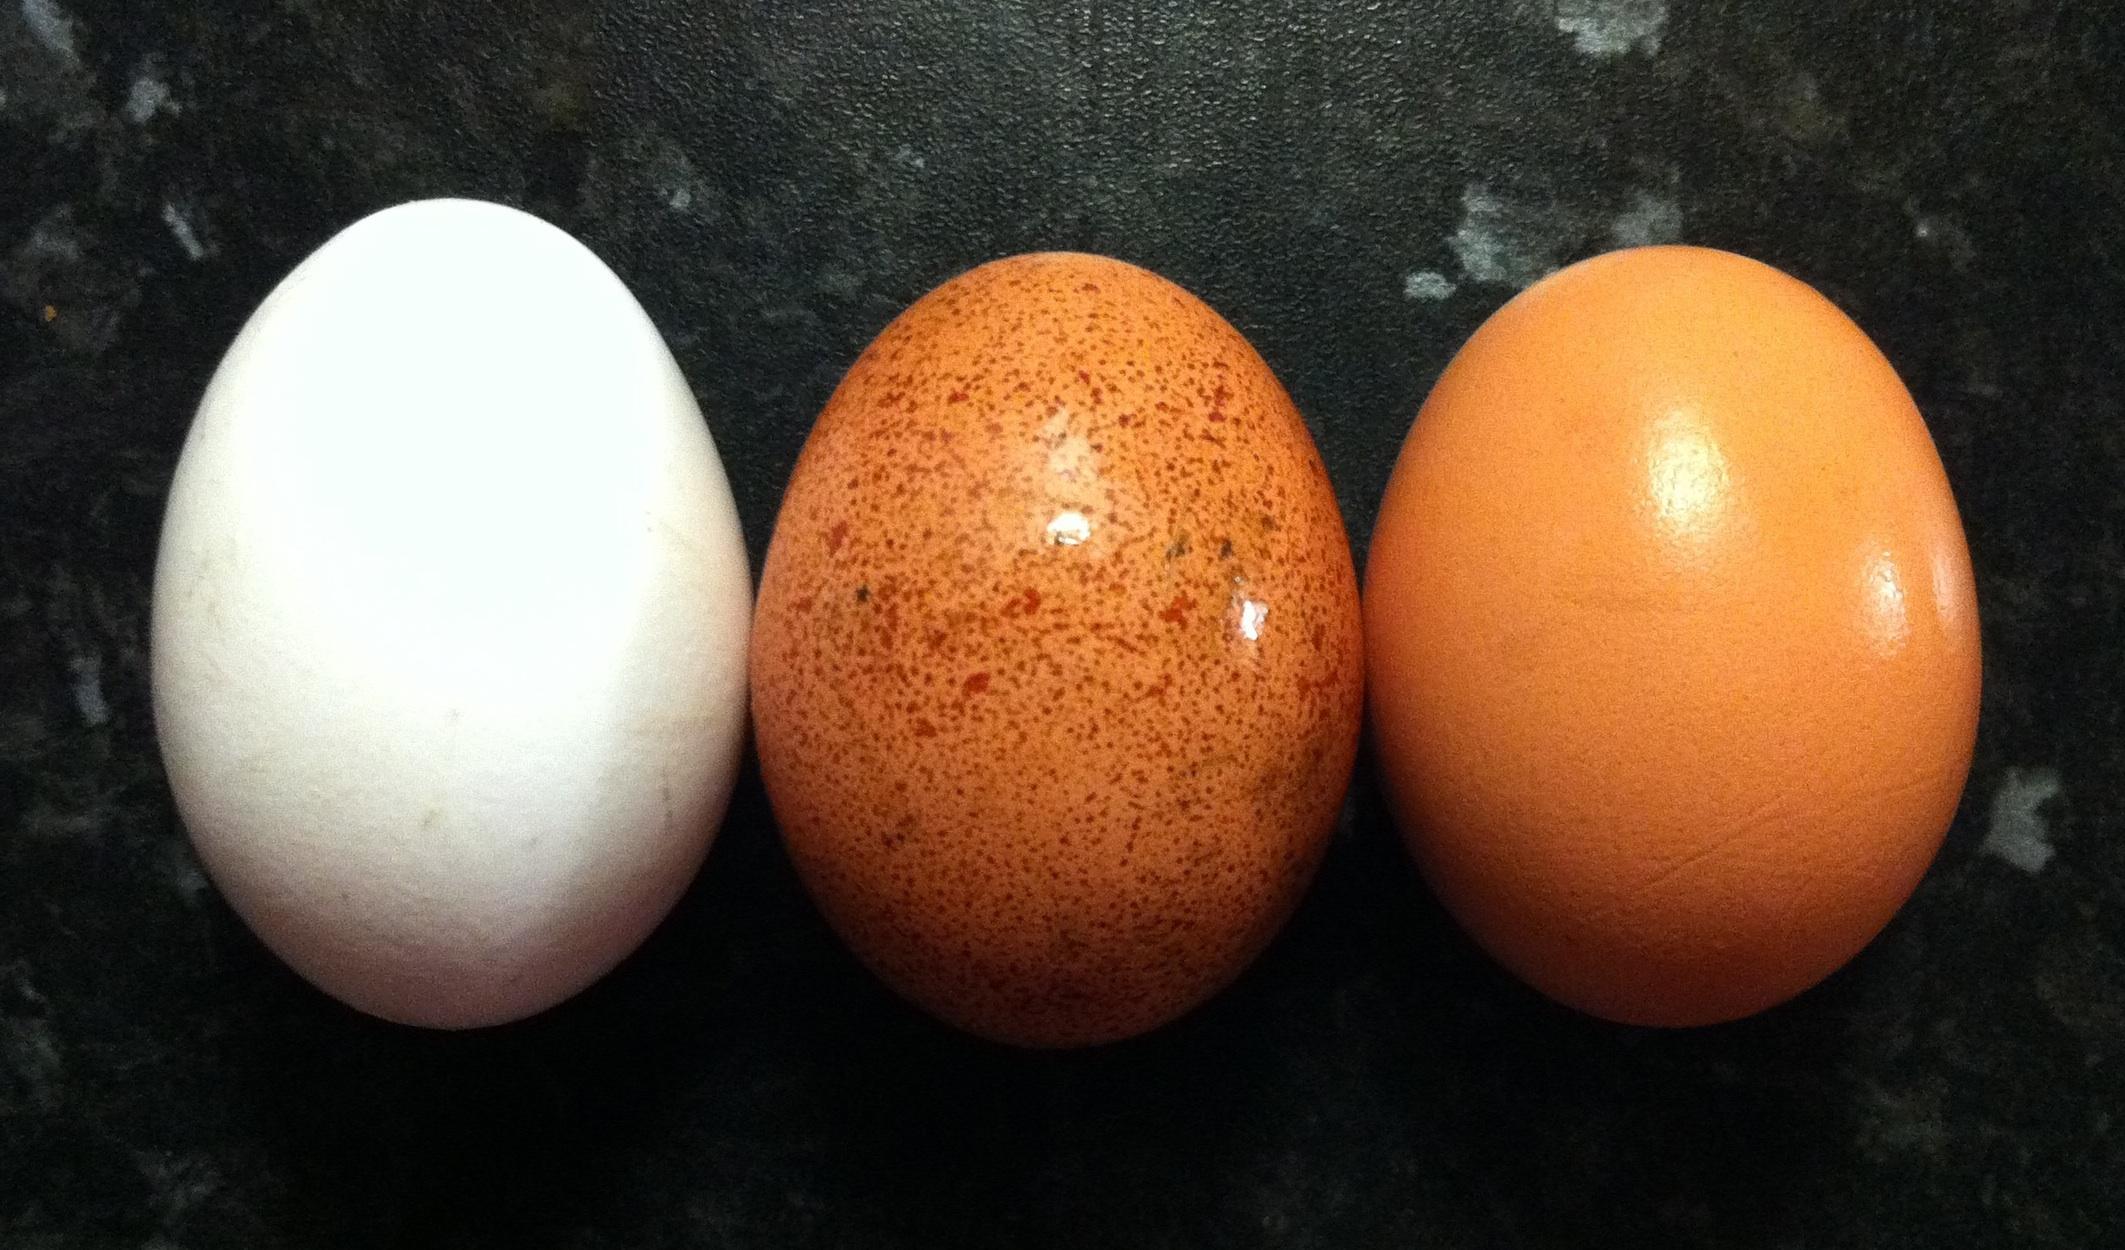 Can a dog eat egg shells?